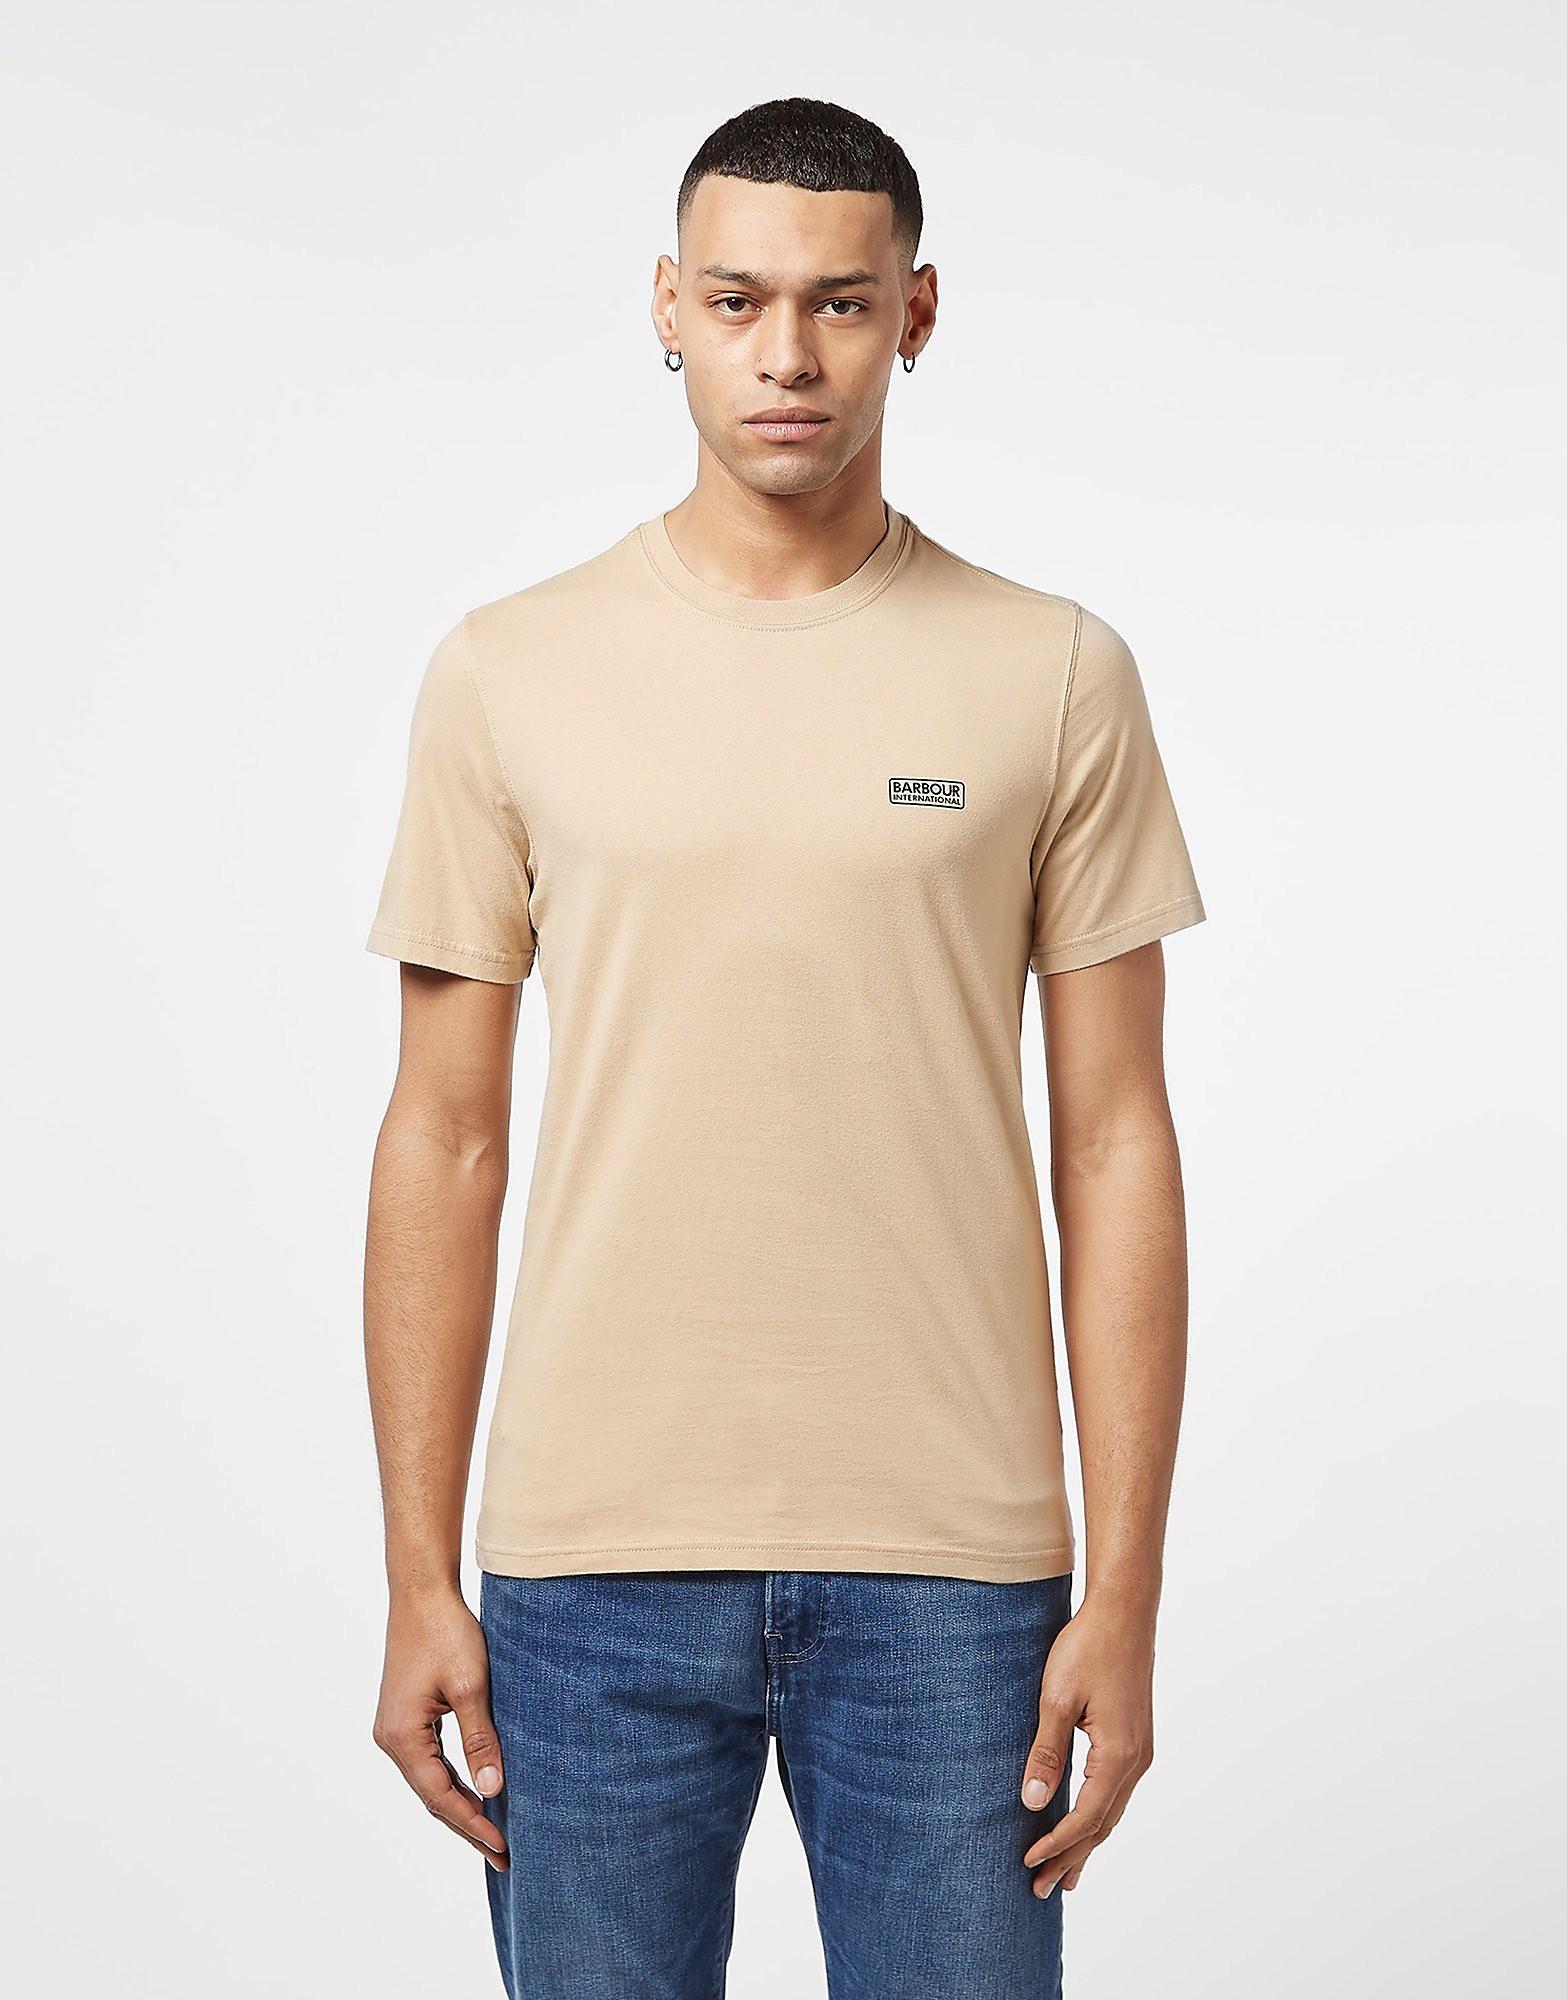 Barbour International Small Logo Short Sleeve T-Shirt